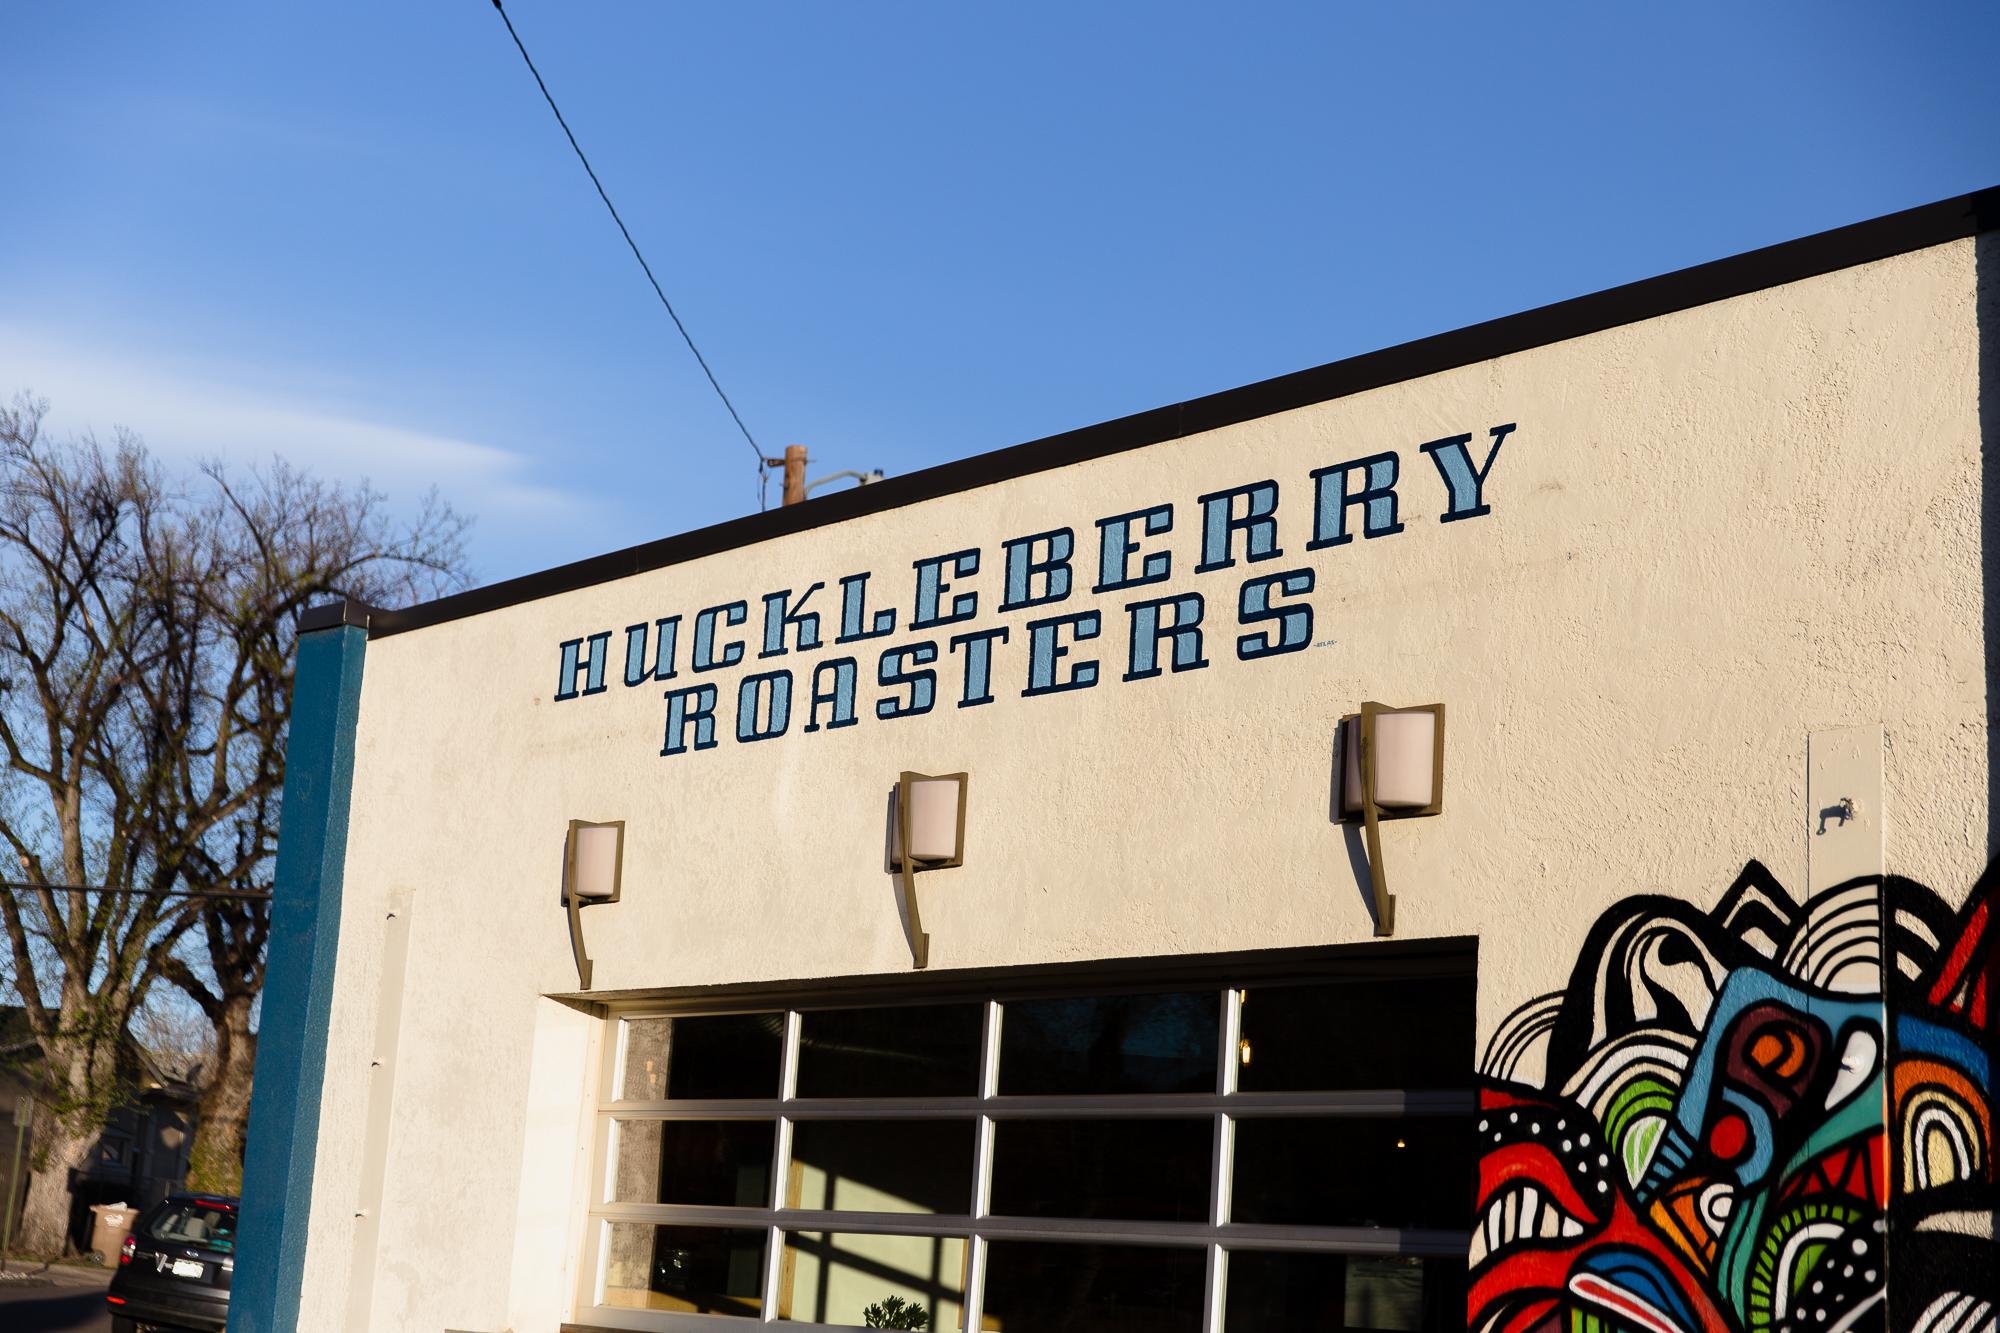 HuckleberryRoasters_303MAG_JasonStilgebouer---31.jpg